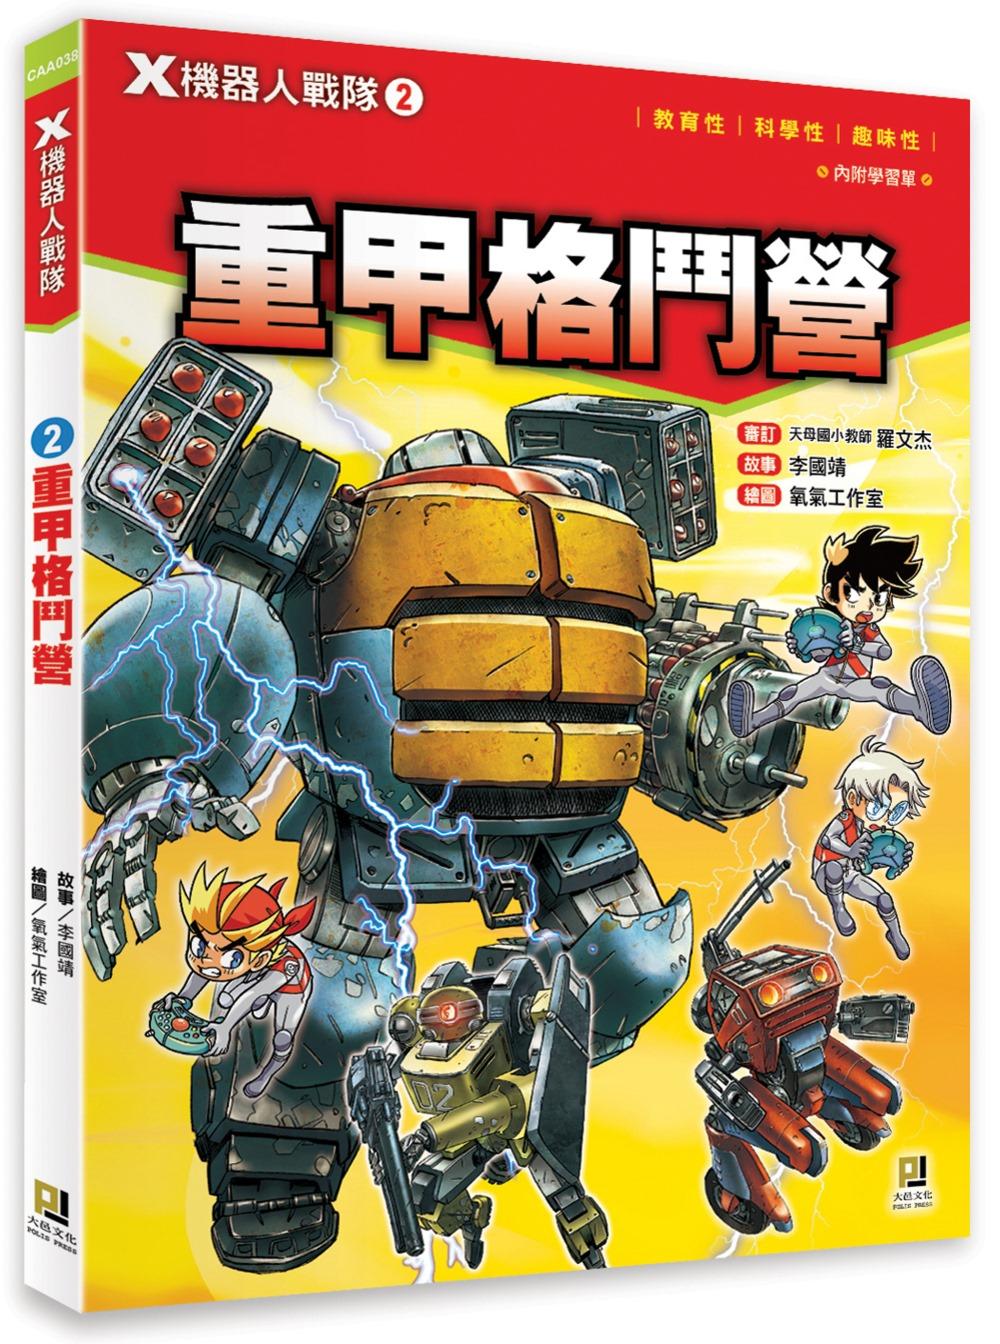 X機器人戰隊 2 重甲格鬥營(附學習單)